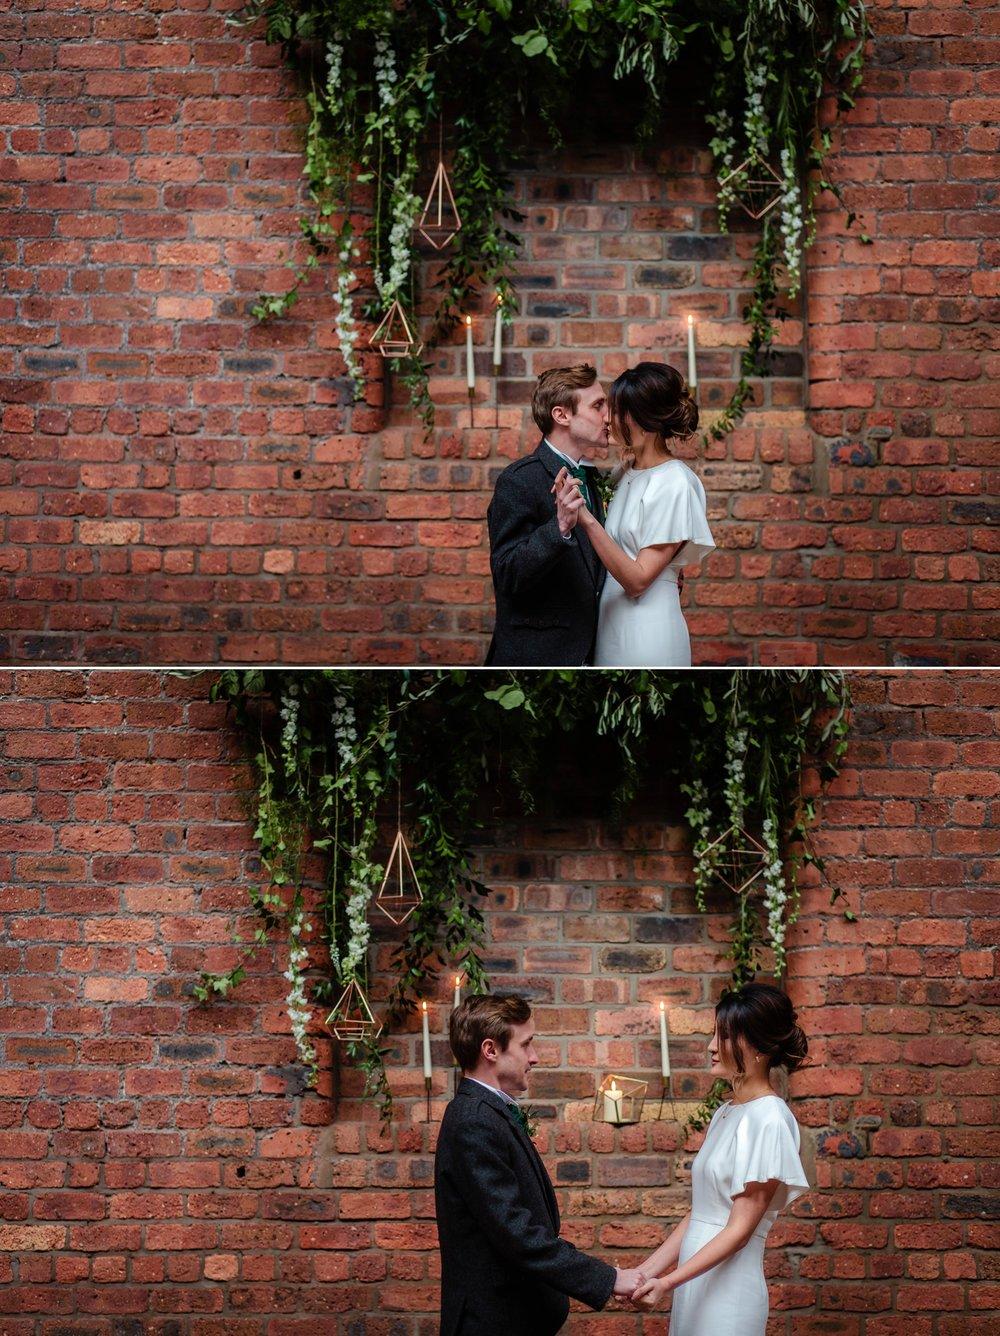 engine-works-wedding-styled-shoot-fotomaki-photography-68.jpg